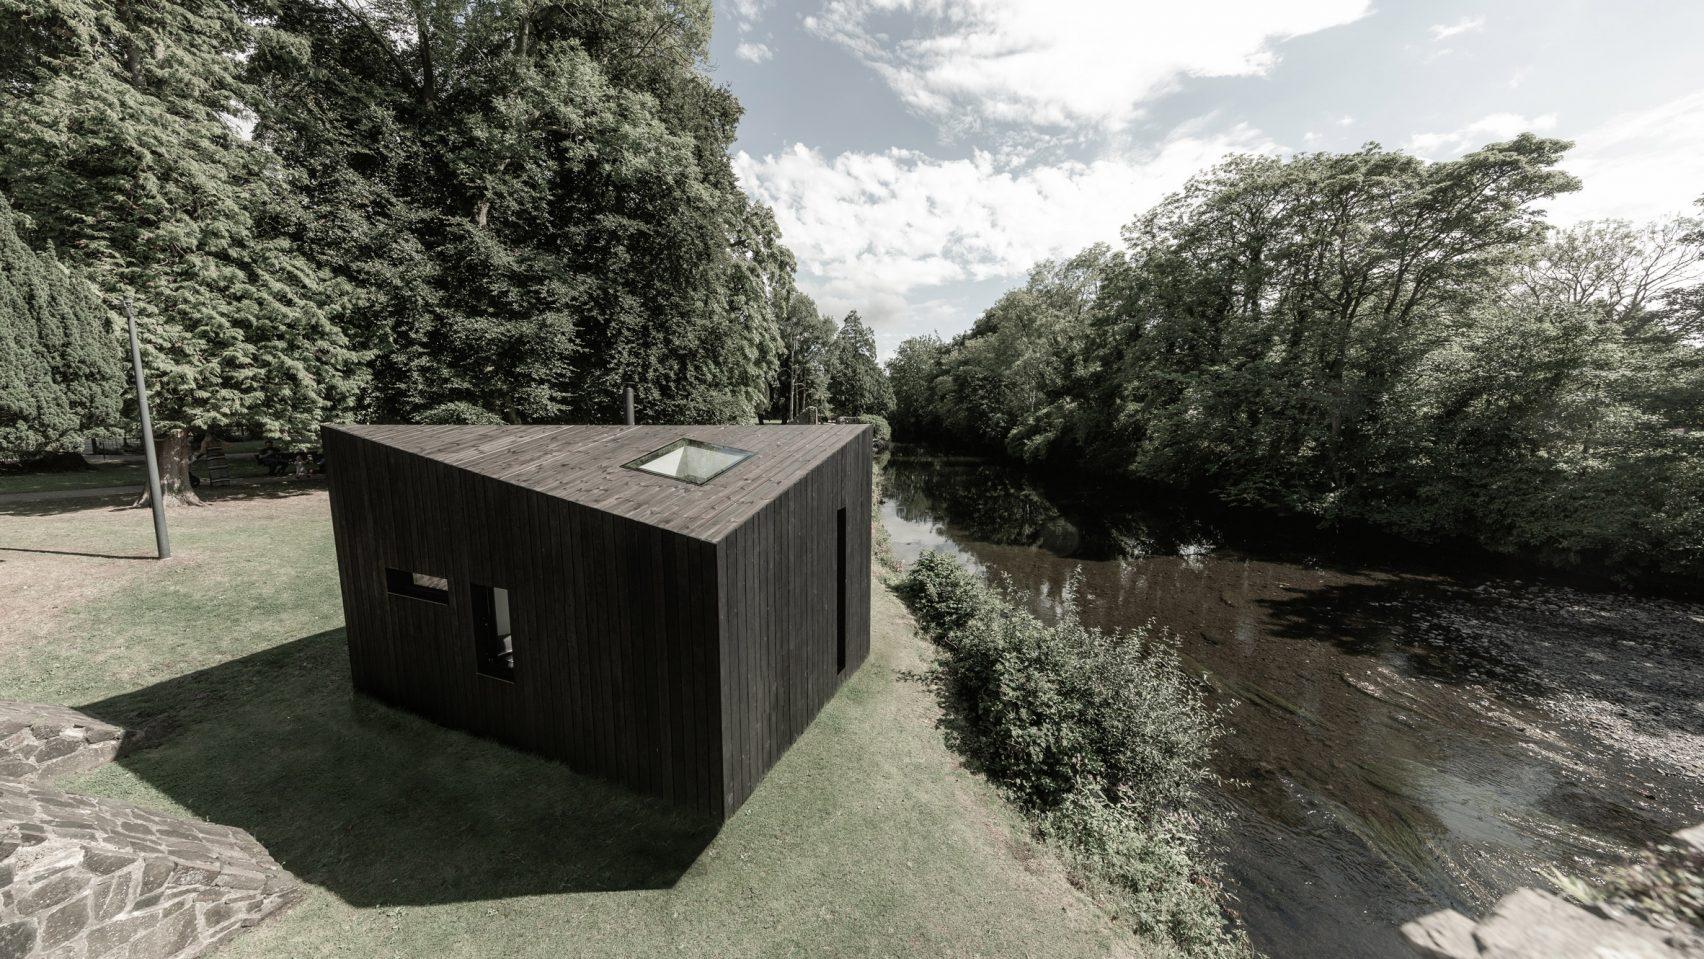 Aerial shot of triangular black wood cabin